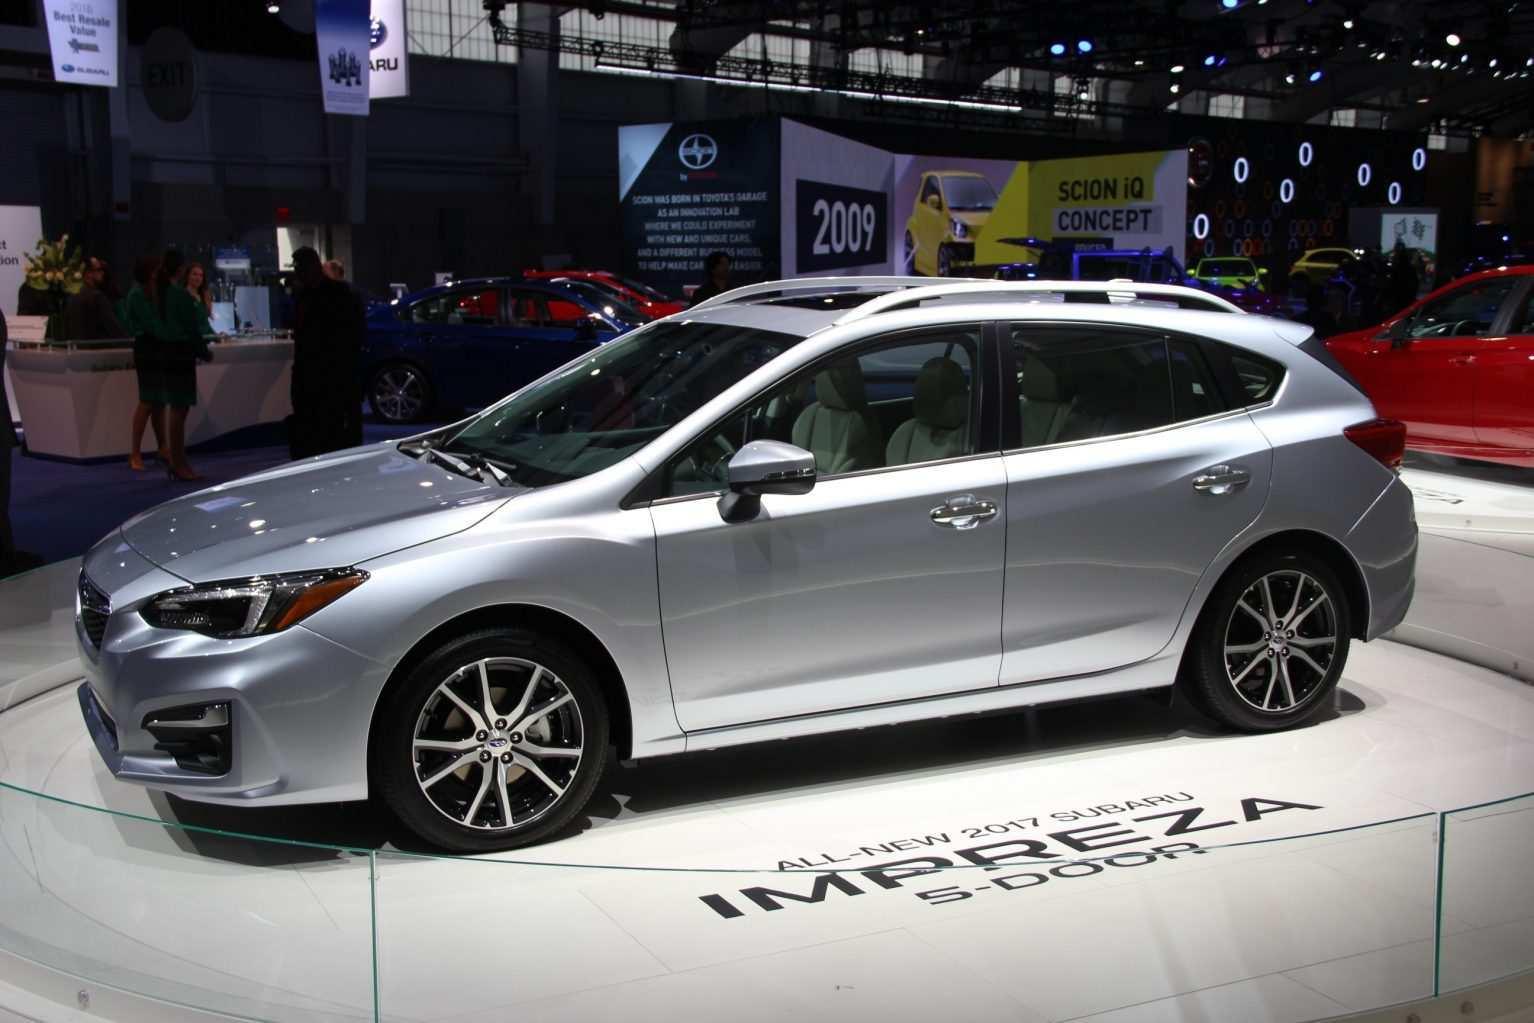 91 Gallery of Subaru 2019 Hatchback Exterior for Subaru 2019 Hatchback